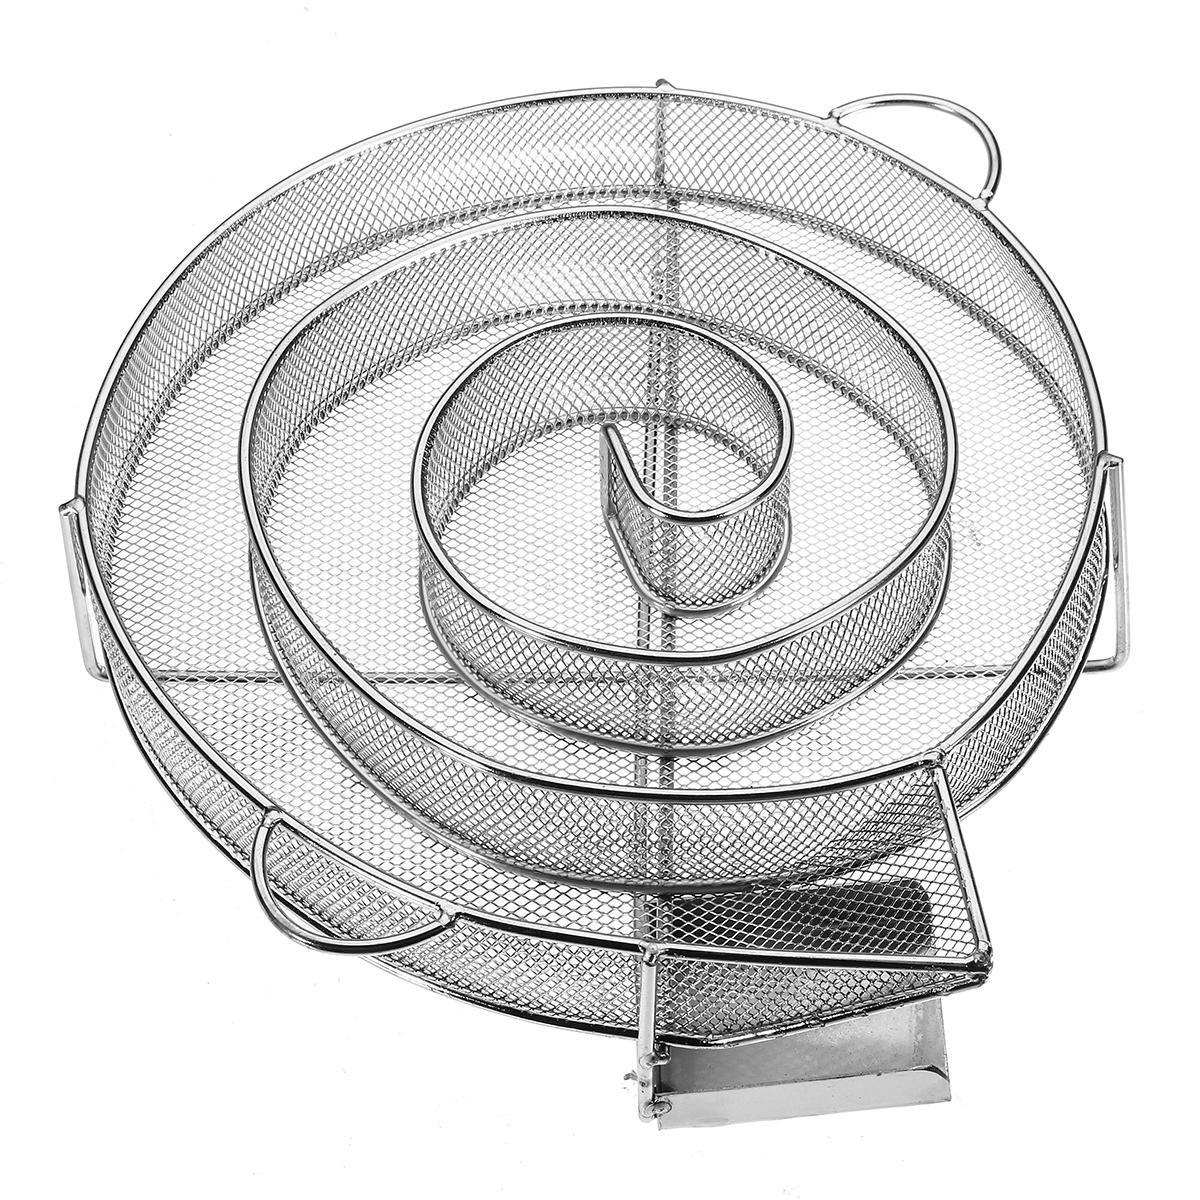 g n rateur de fum e froide en acier inoxydable barbecue. Black Bedroom Furniture Sets. Home Design Ideas